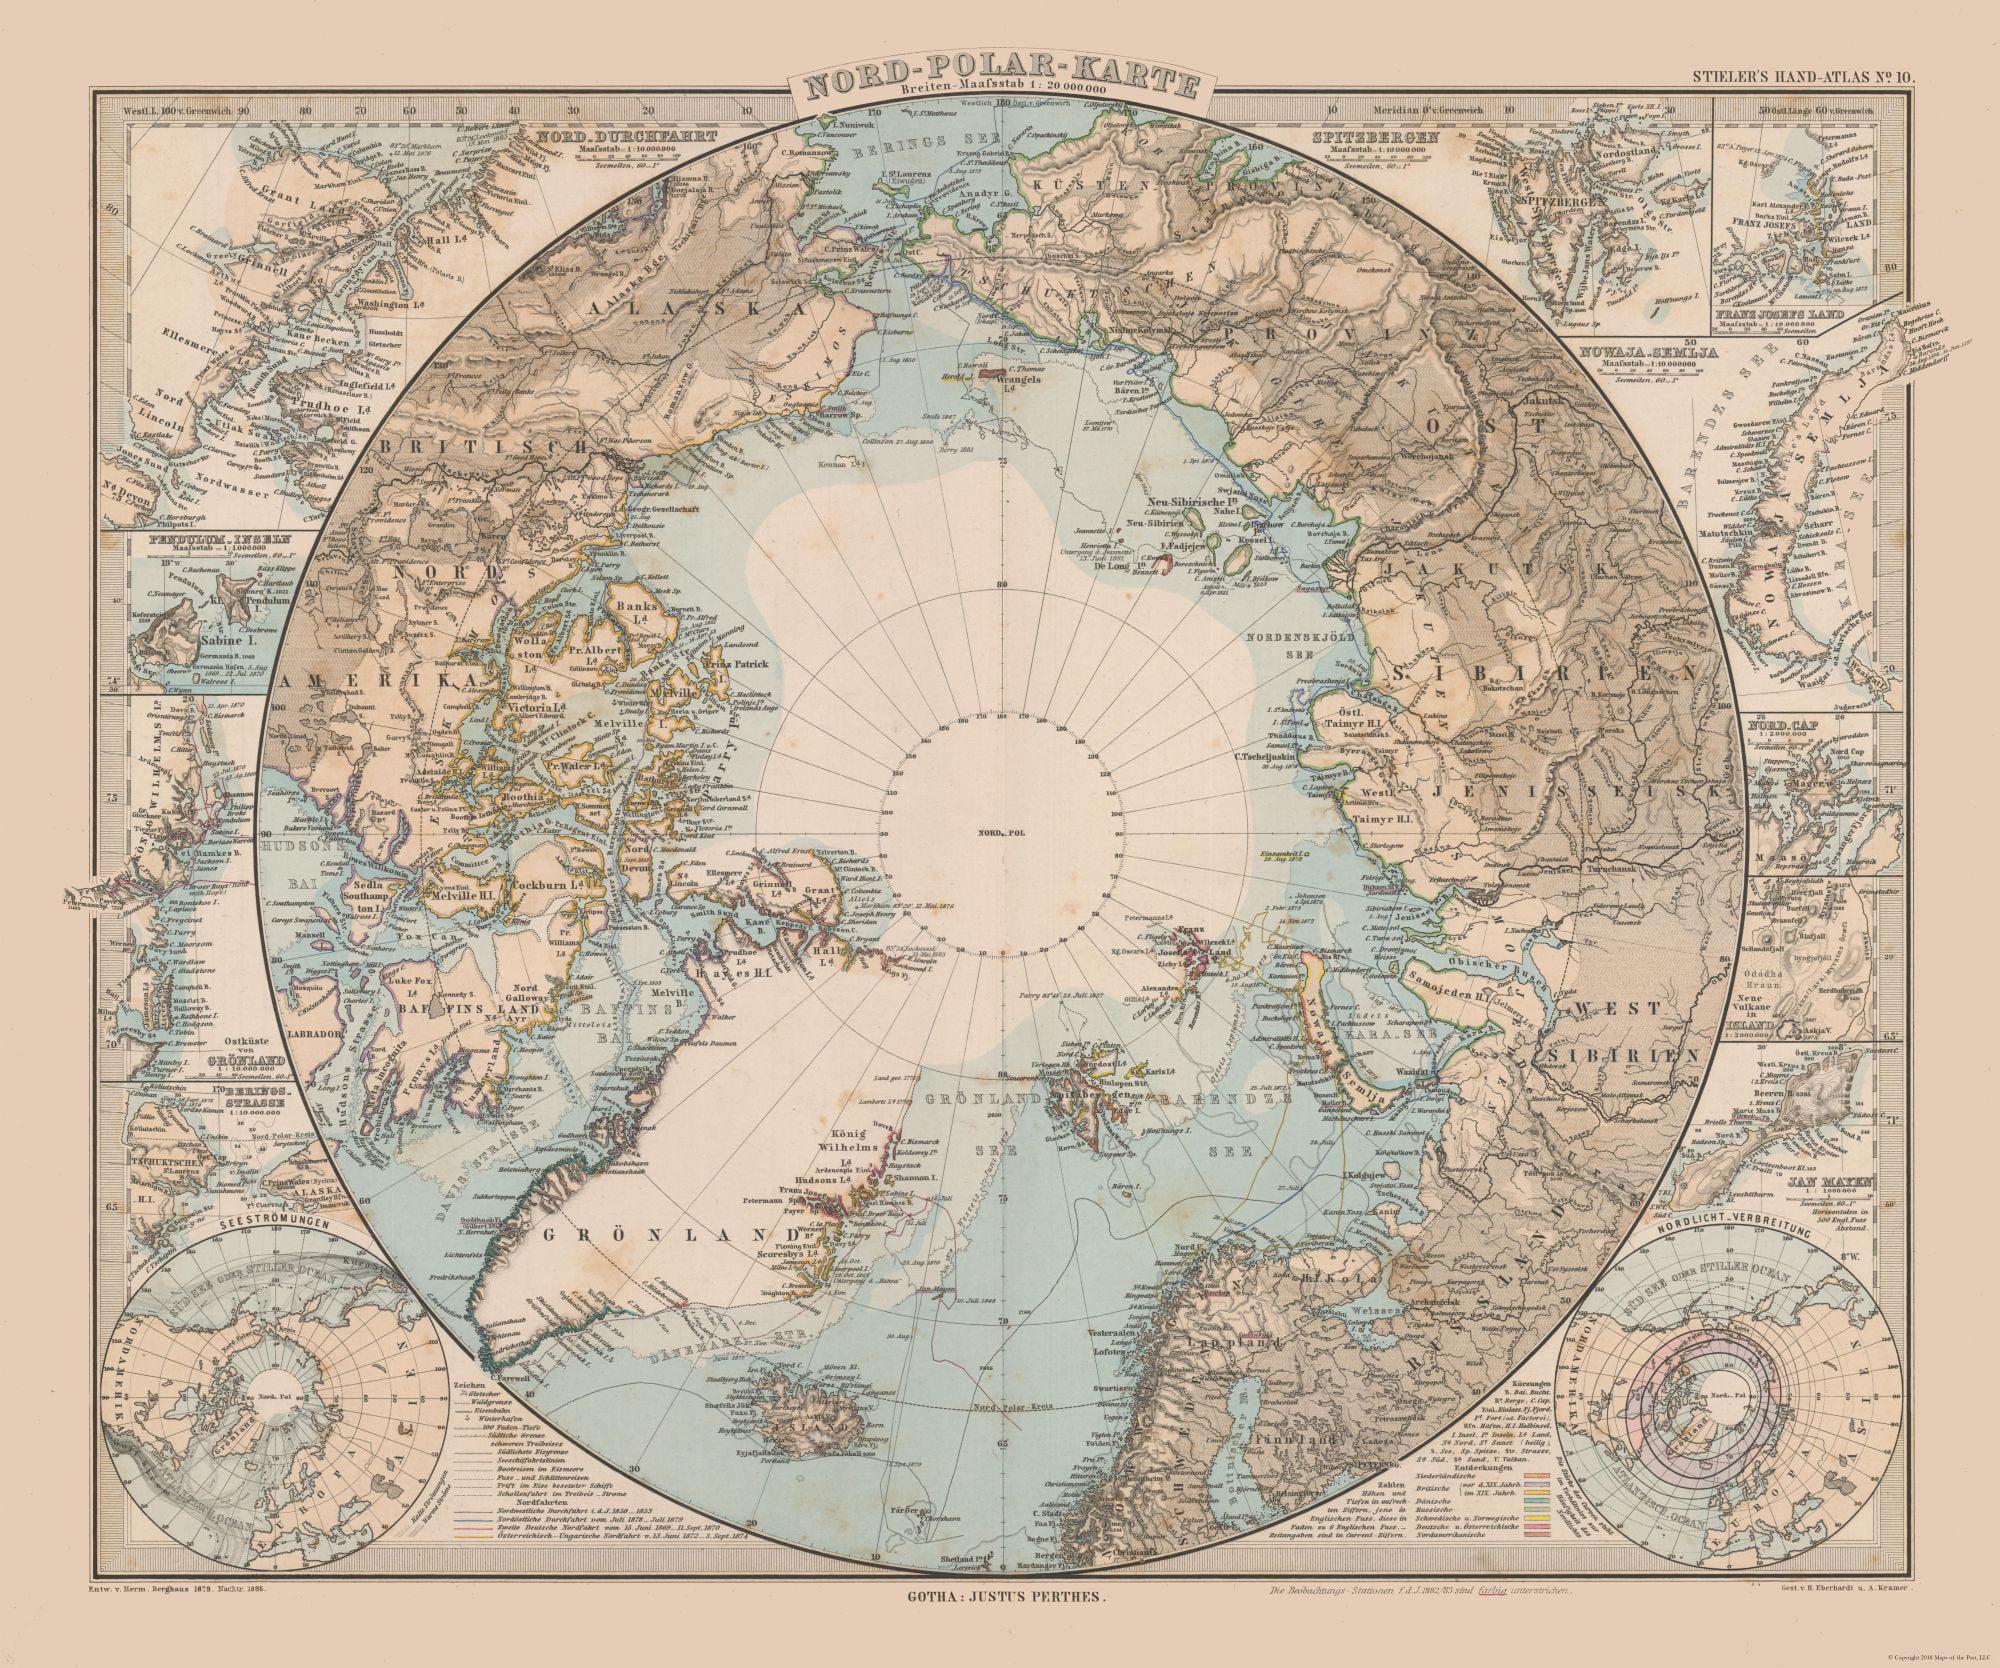 Old World Map North Pole Stielers 1885 27 57 X 23 Walmart Com